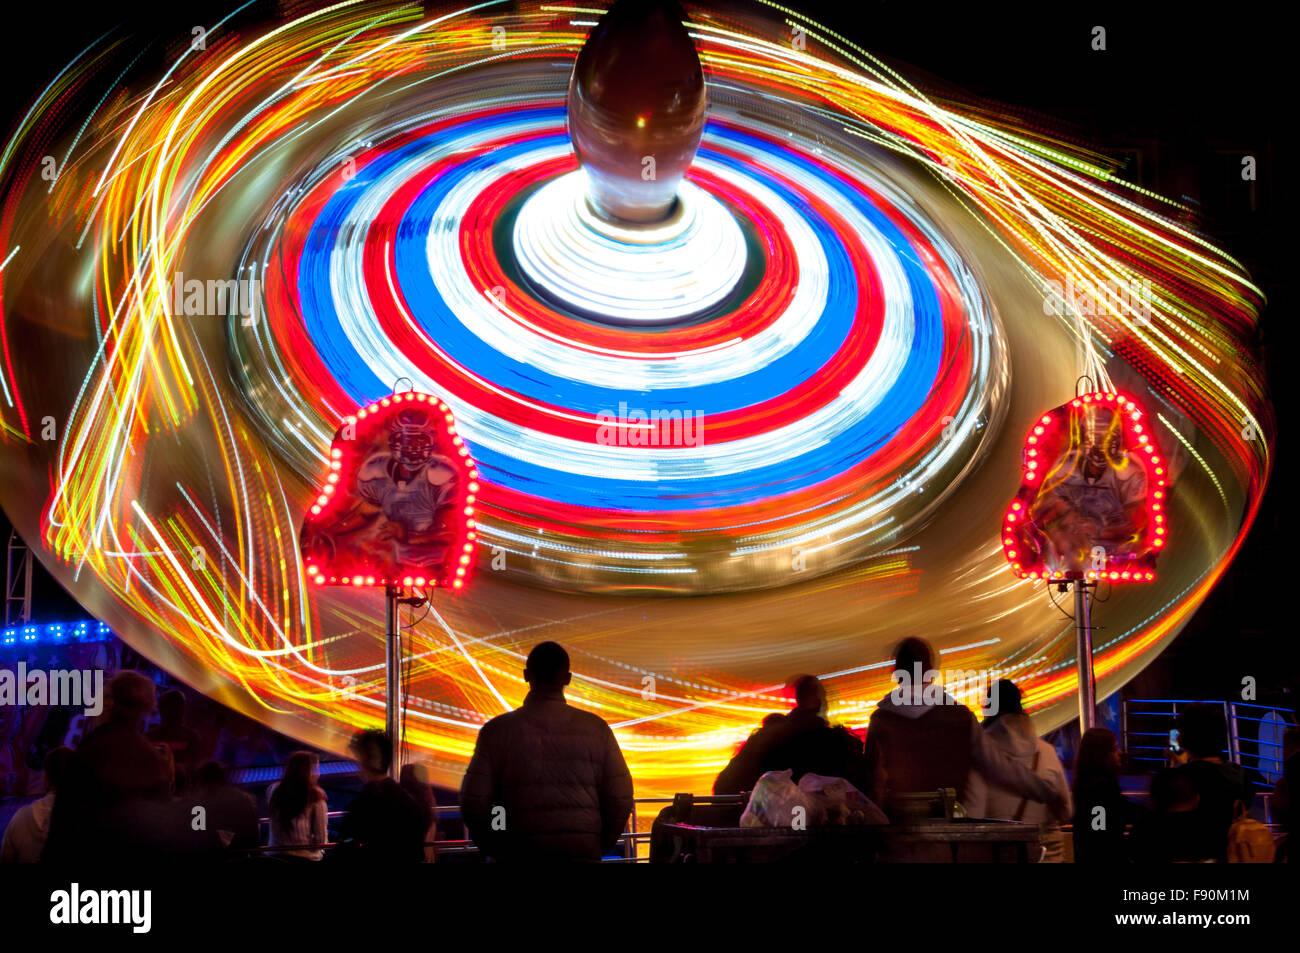 The St Giles Fair, Oxford, United Kingdom Stock Photo